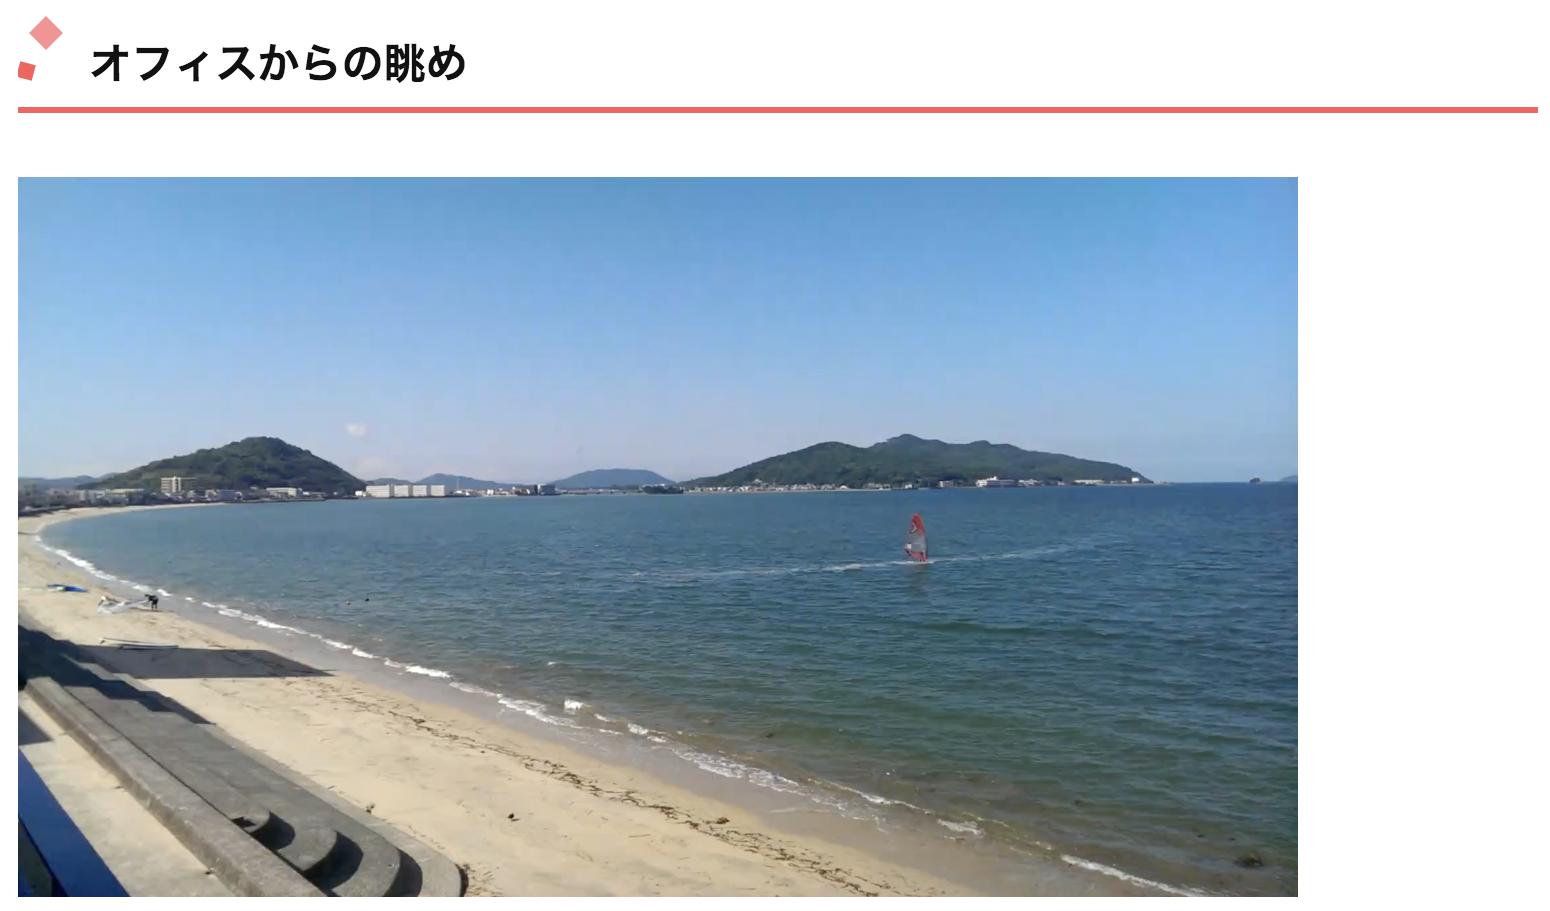 f:id:atsuhiro-me:20180203011113p:plain:w300